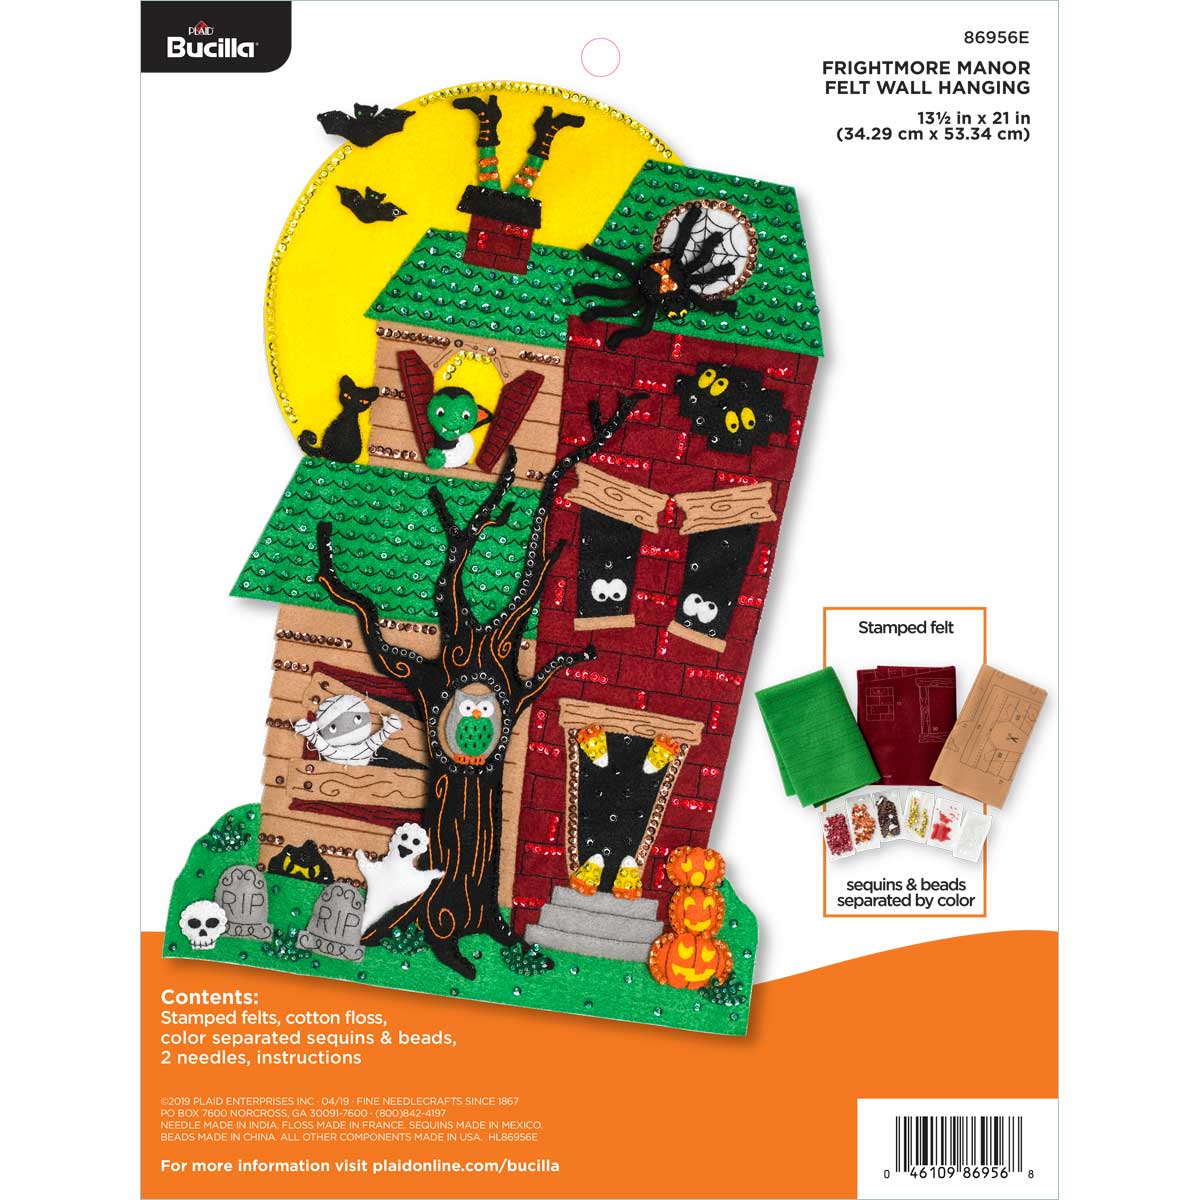 Bucilla ® Seasonal - Felt - Home Decor - Frightmore Manor Wall Hanging - 86956E